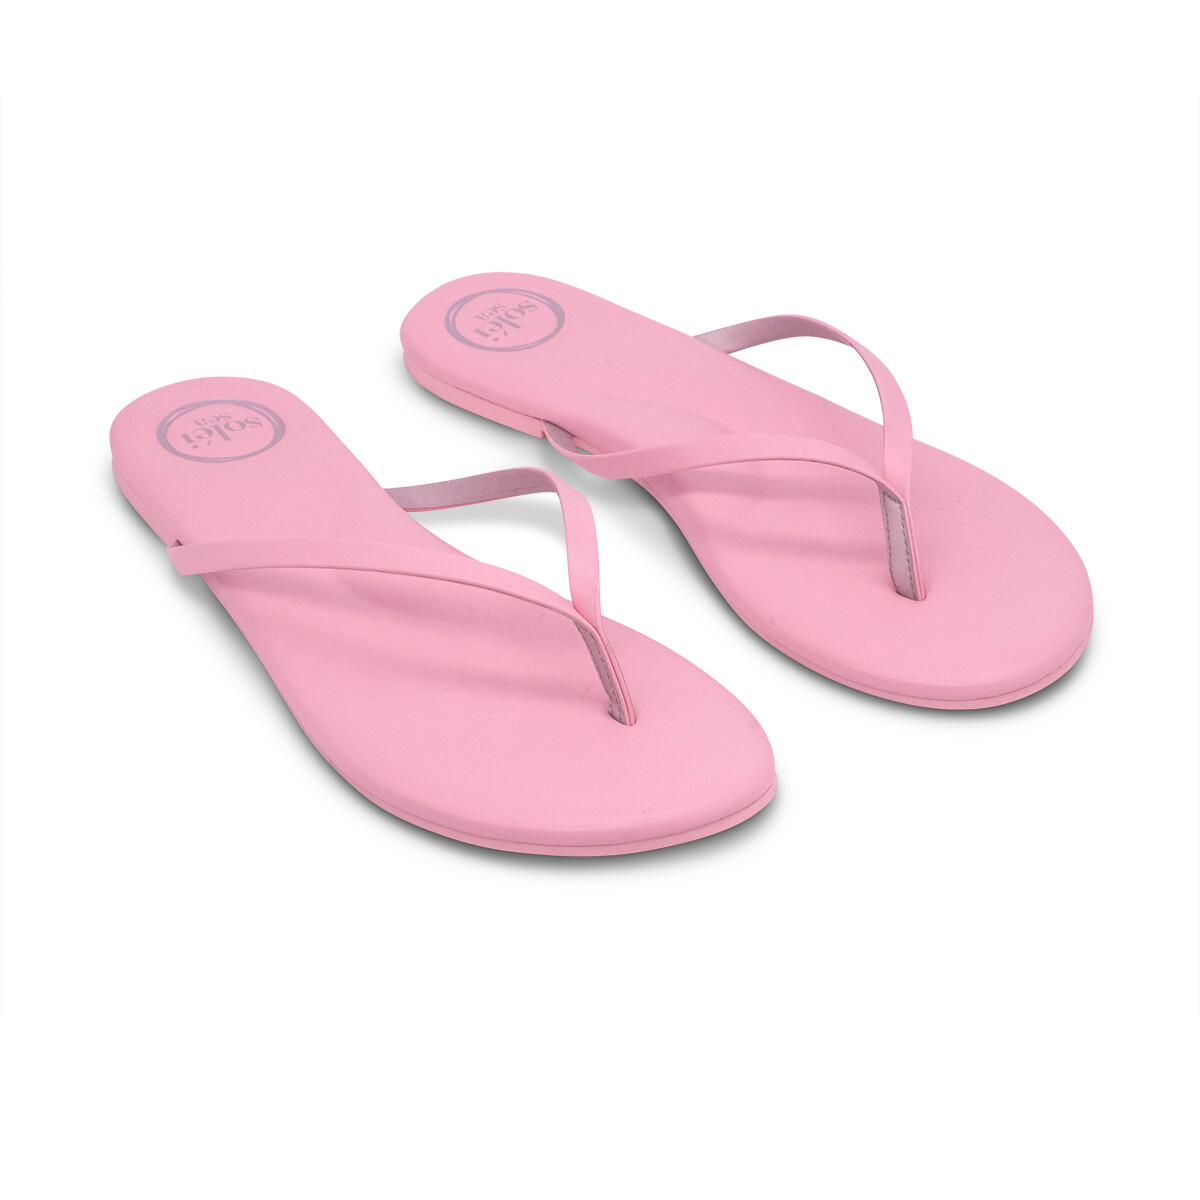 Solei Sea, Flip Flops, Baby Pink